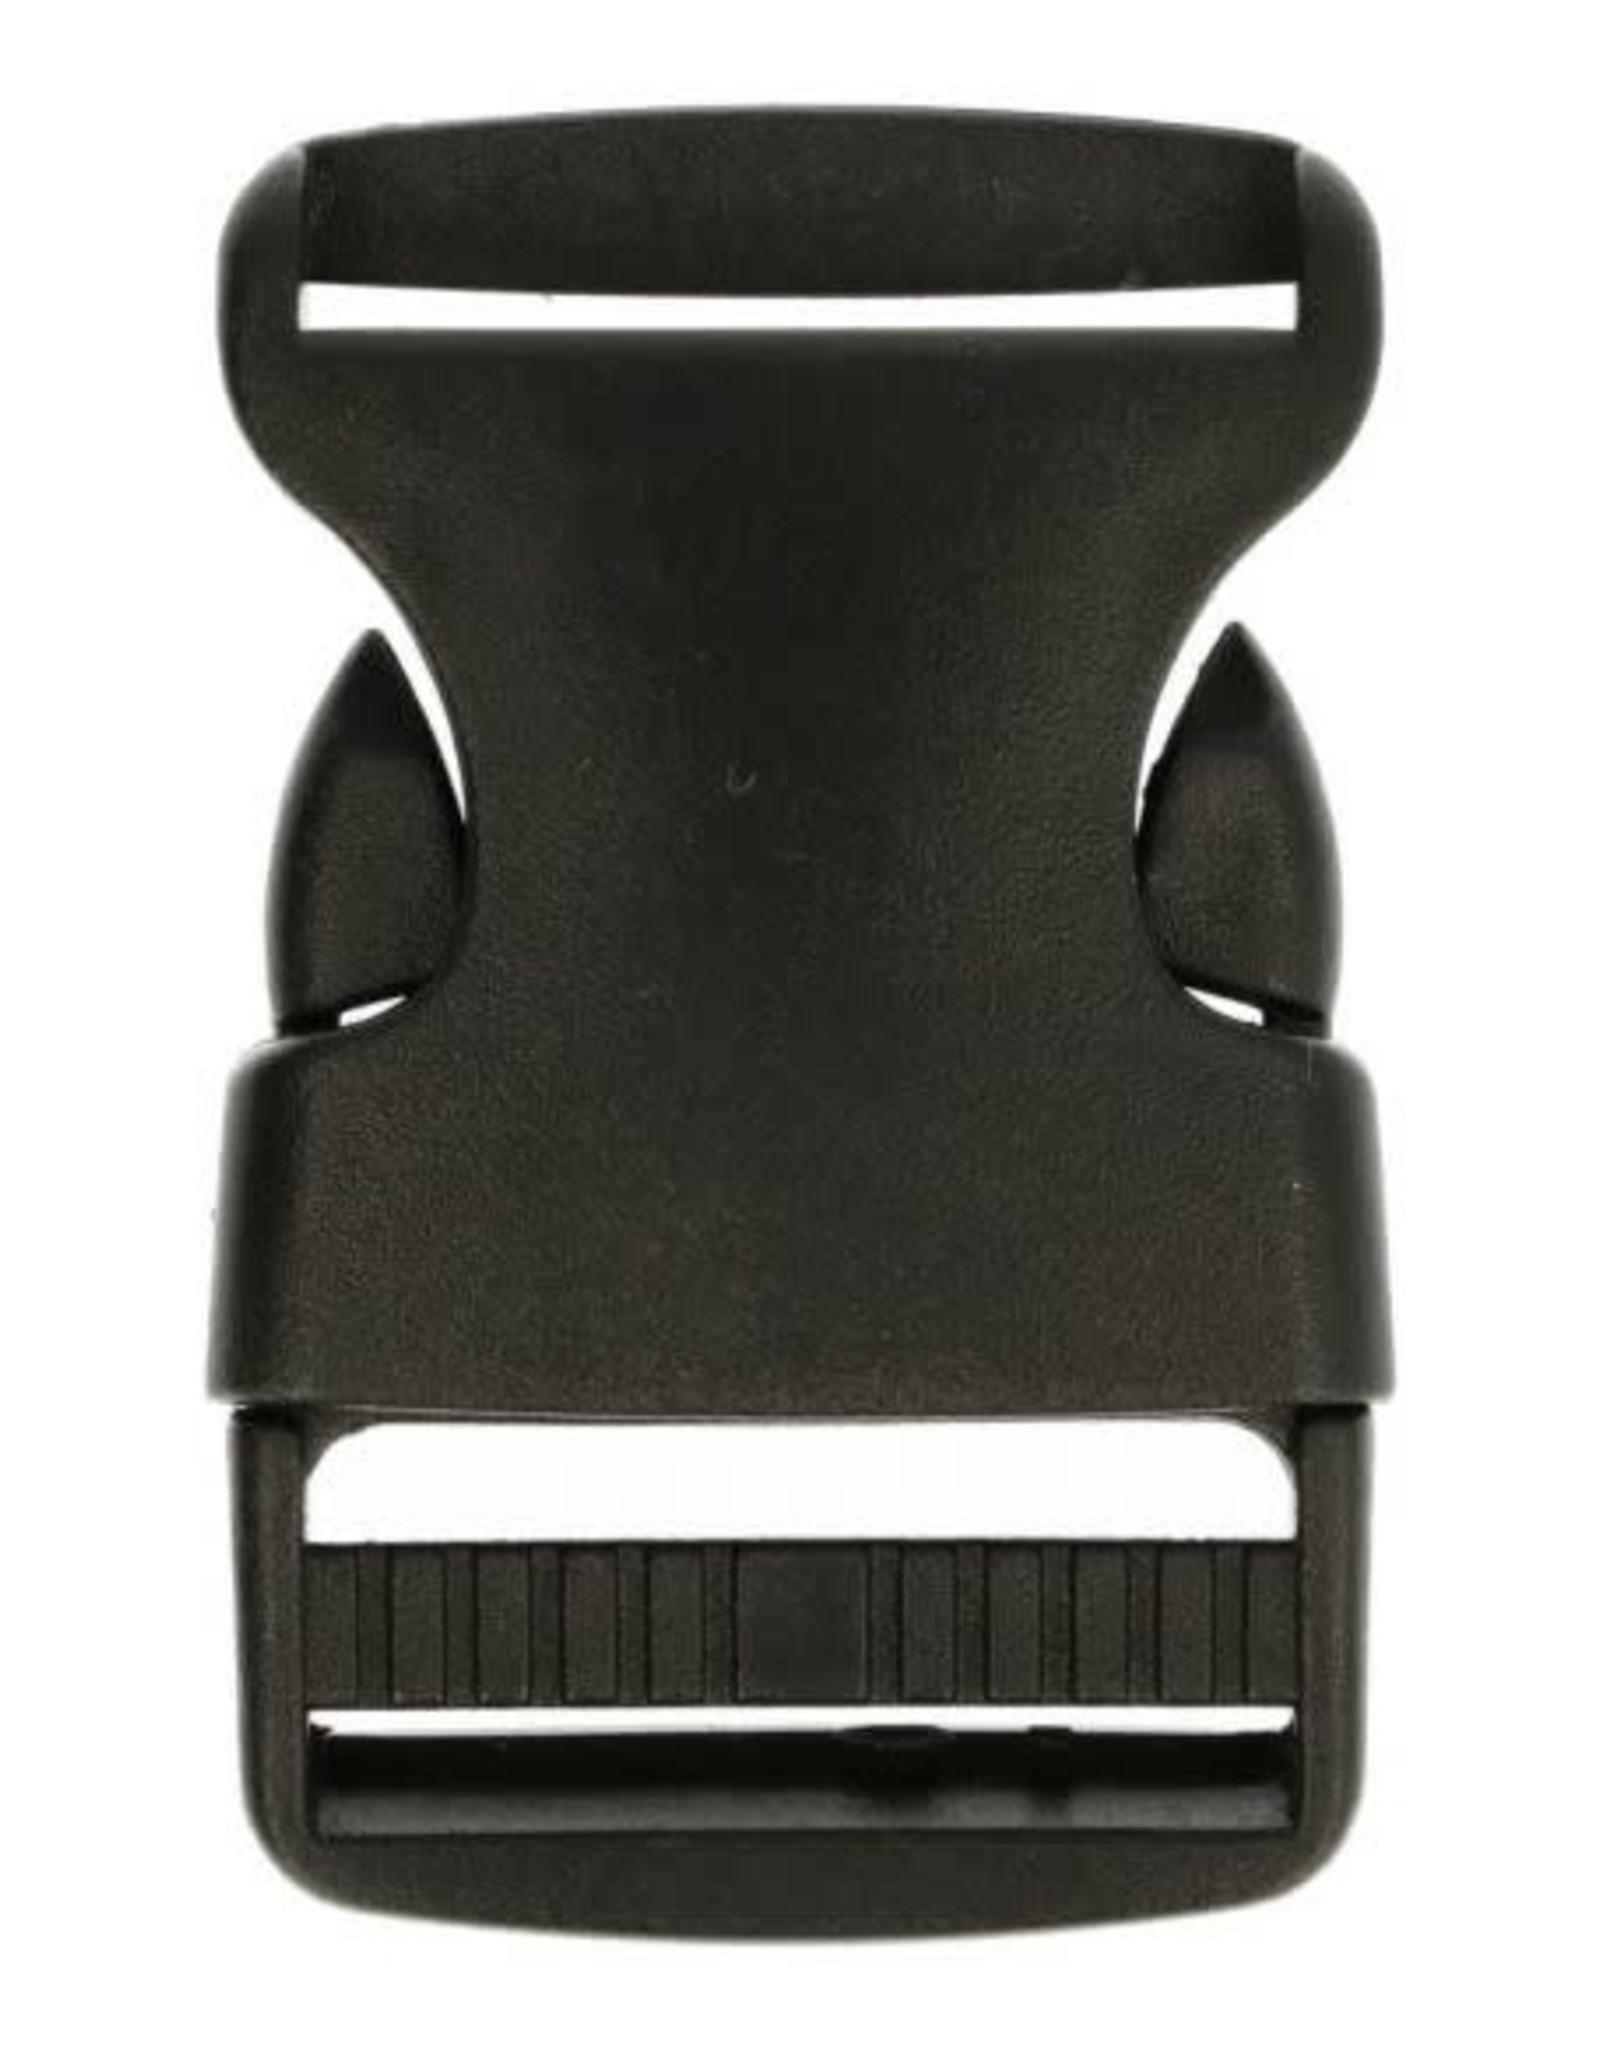 Klikgesp 30mm - Zwart